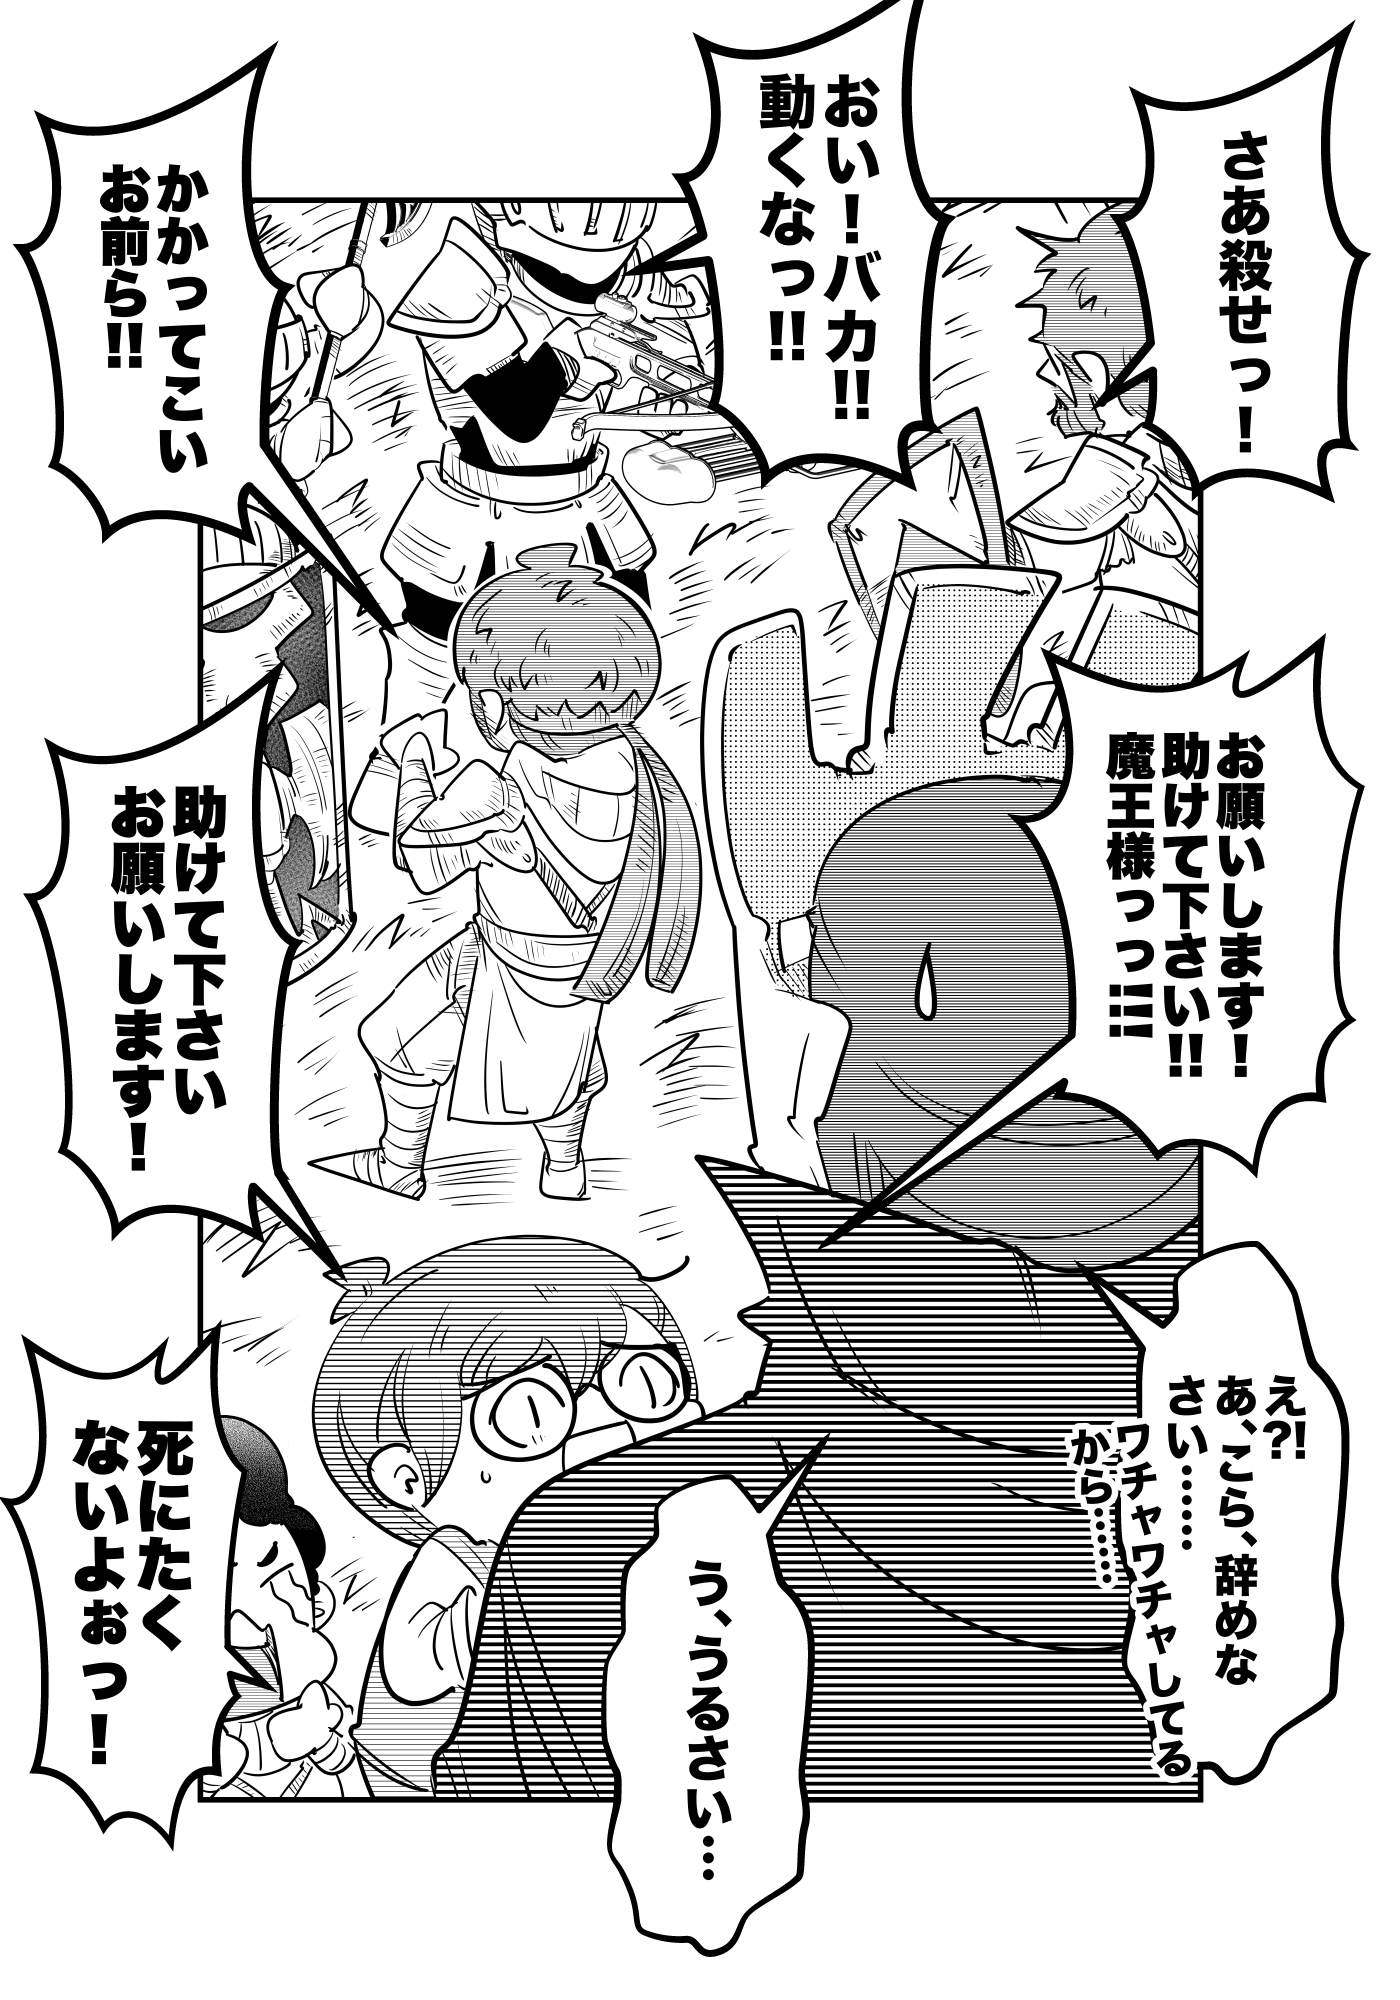 f:id:terashimaru117:20210914224203p:plain